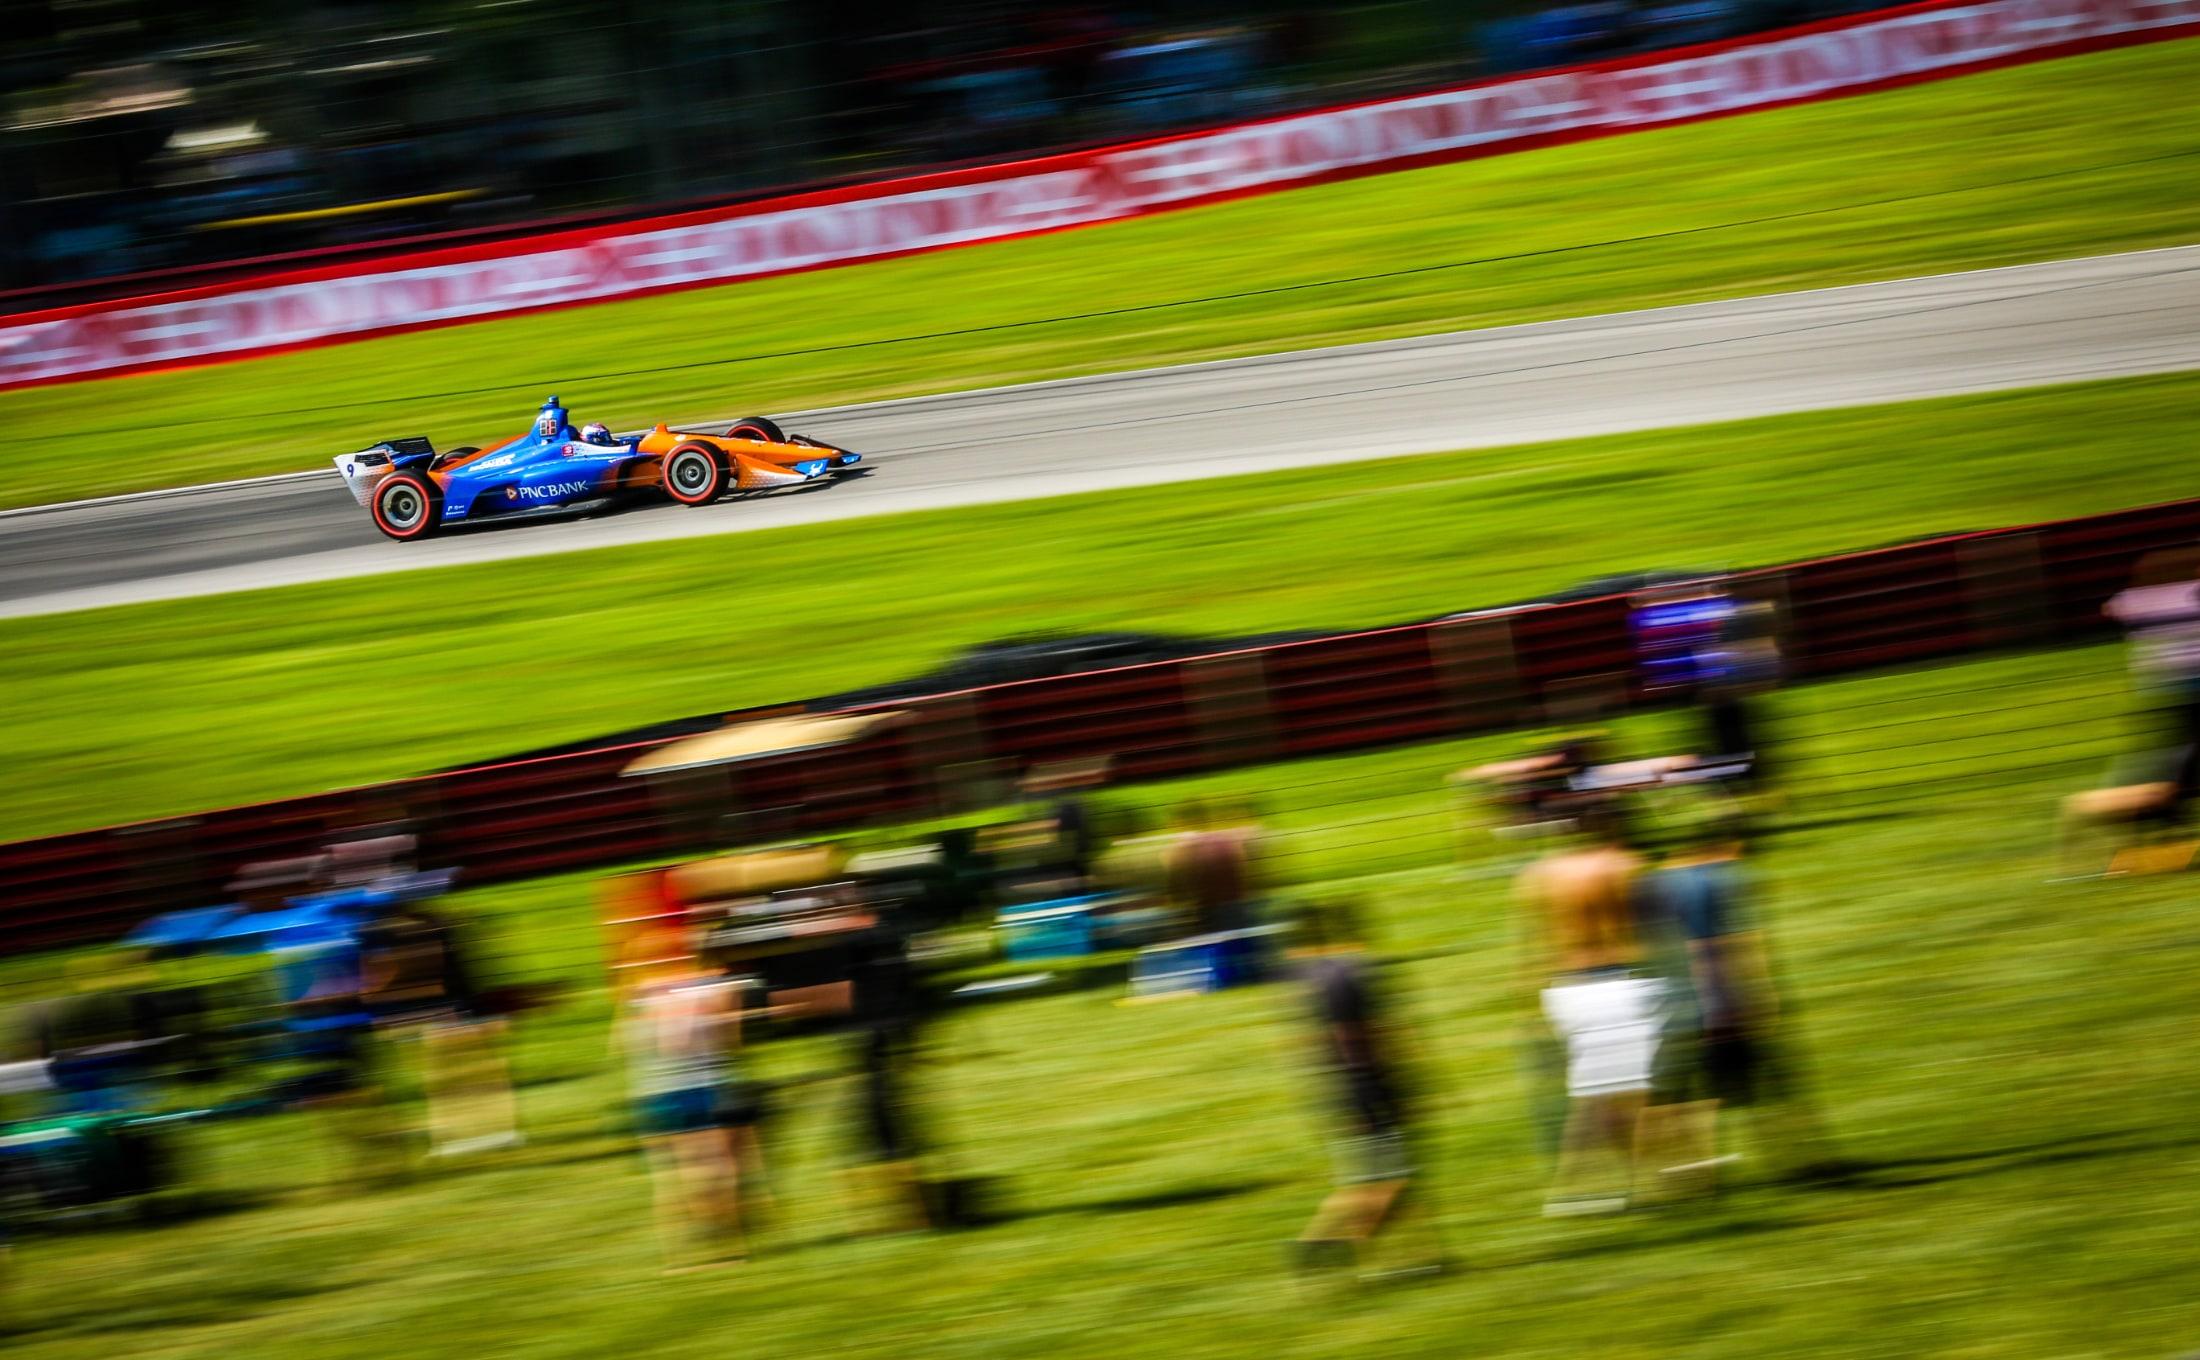 Scott Dixon in PNC Bank Ganassi Indy car in 2019 Mid-Ohio race